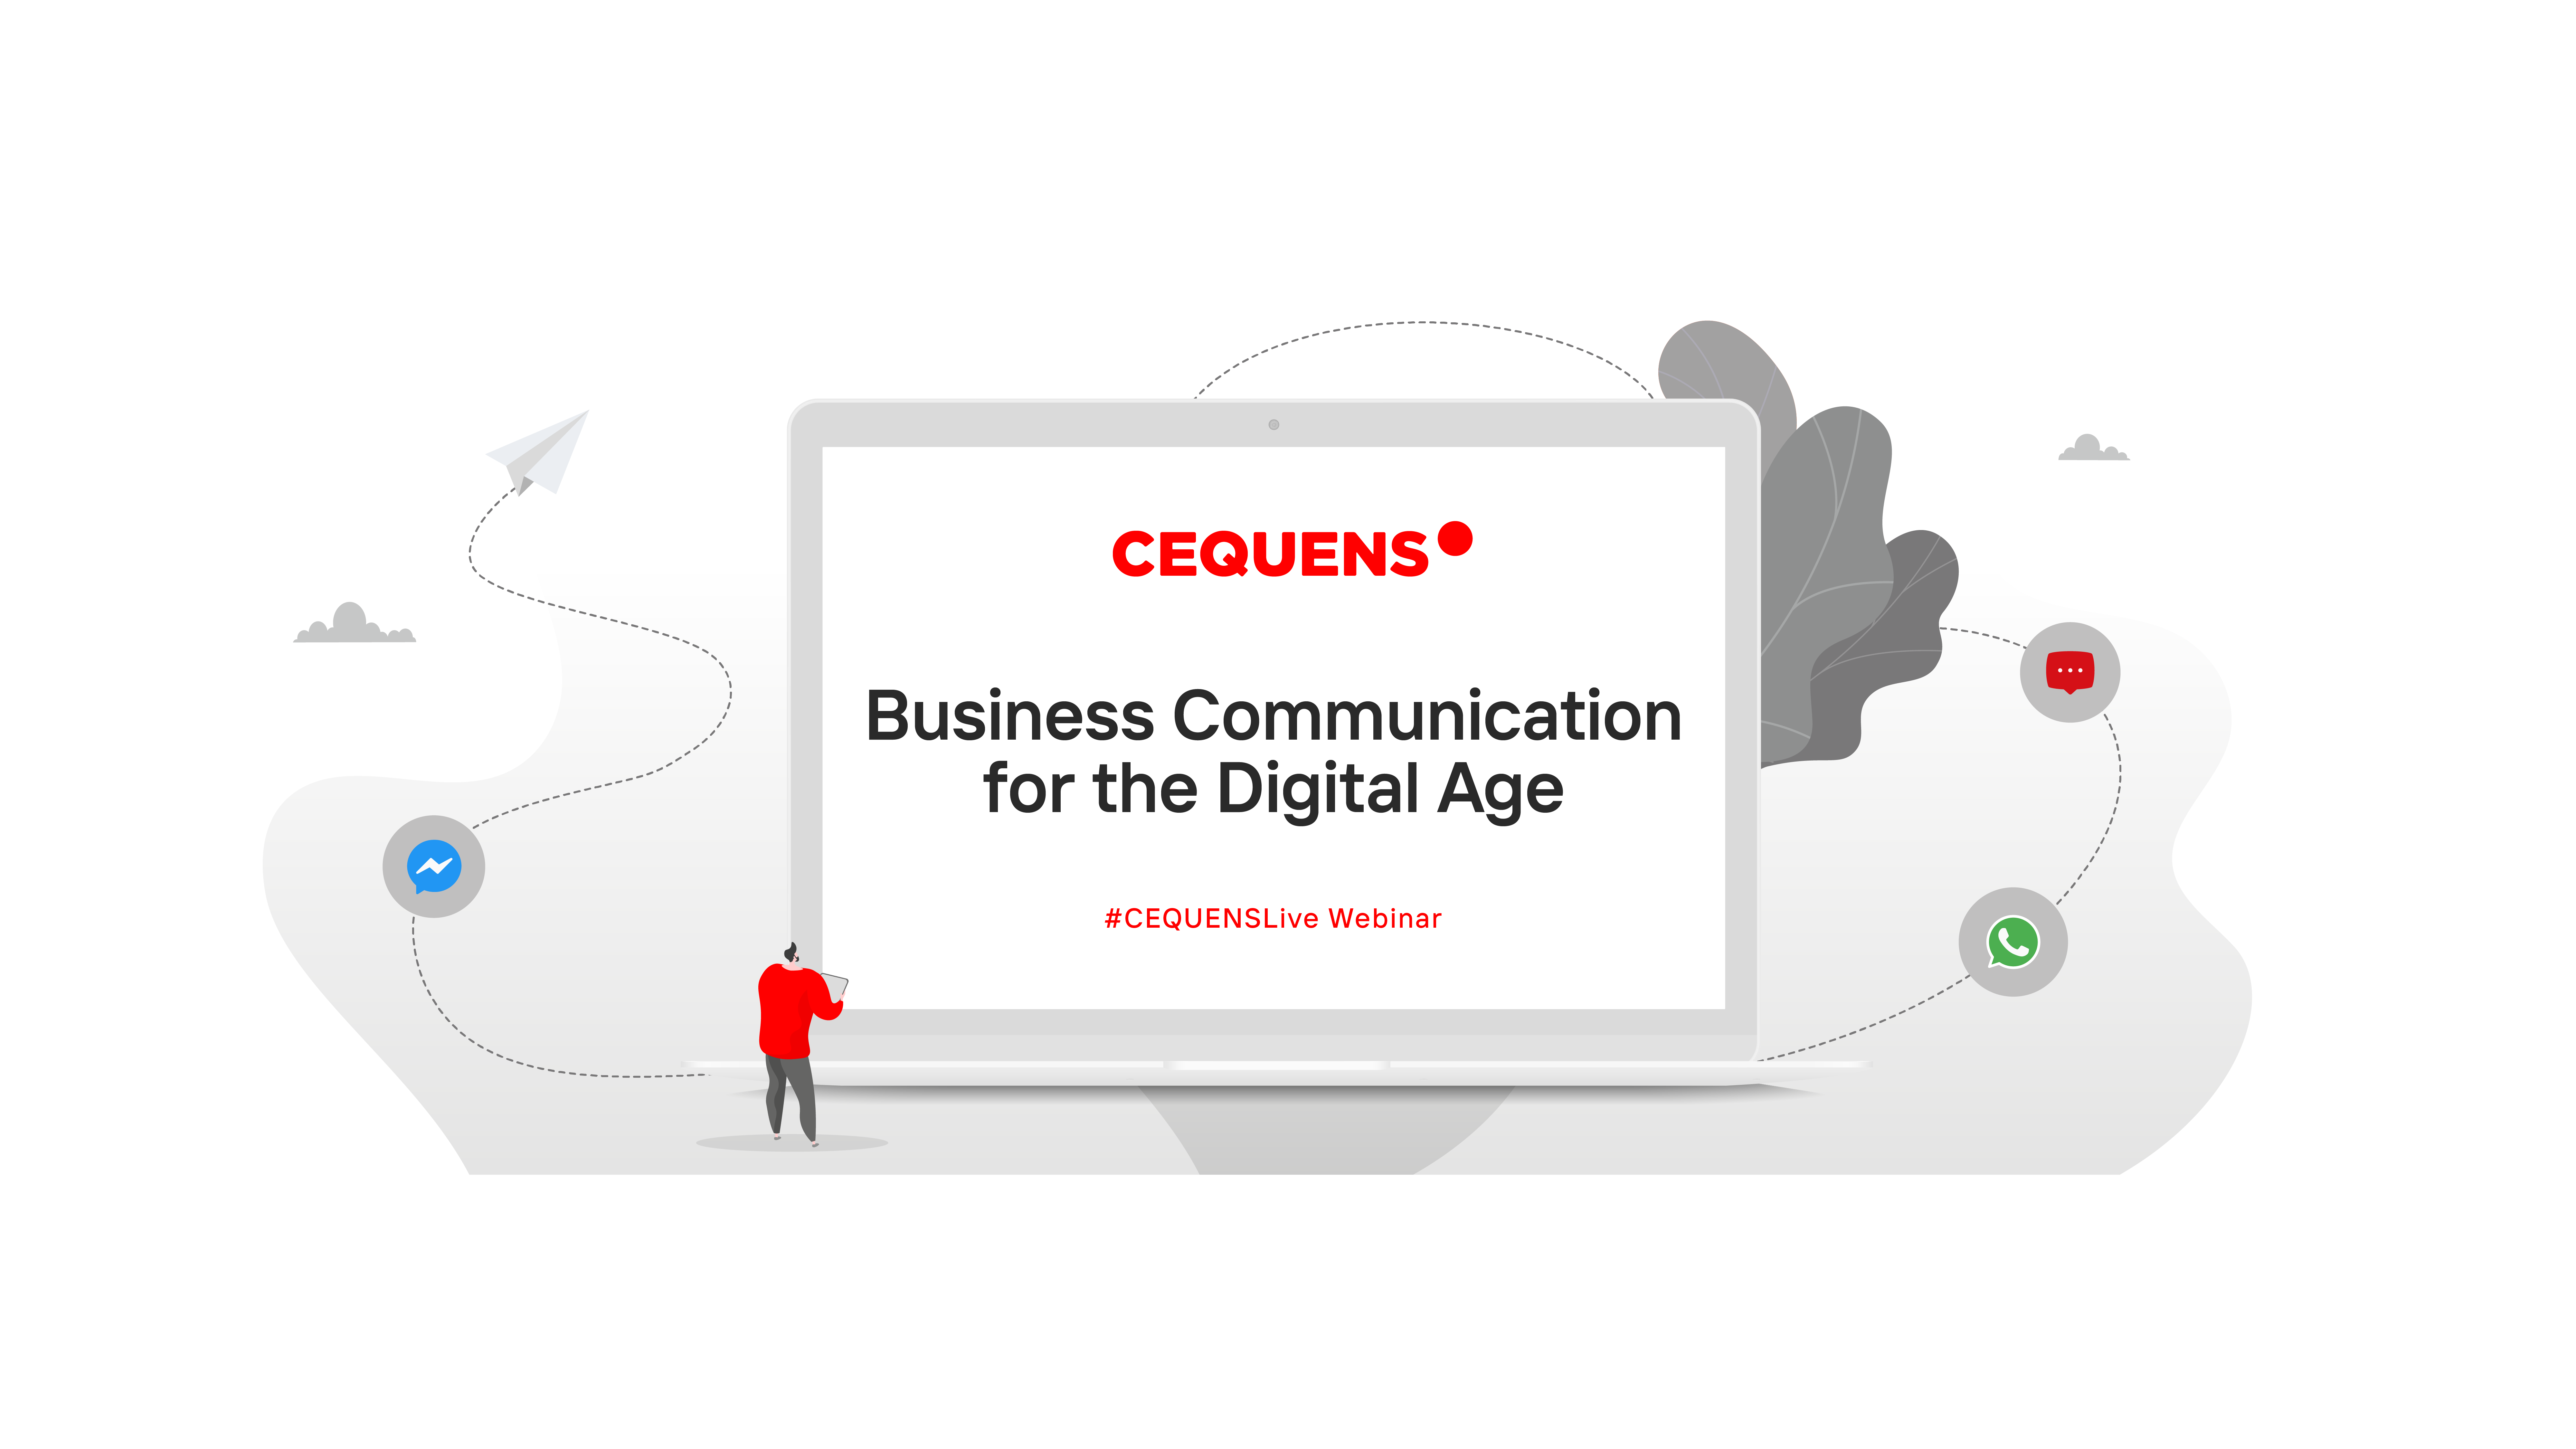 #CEQUENSLive Webinar: Business Communication for the Digital Age